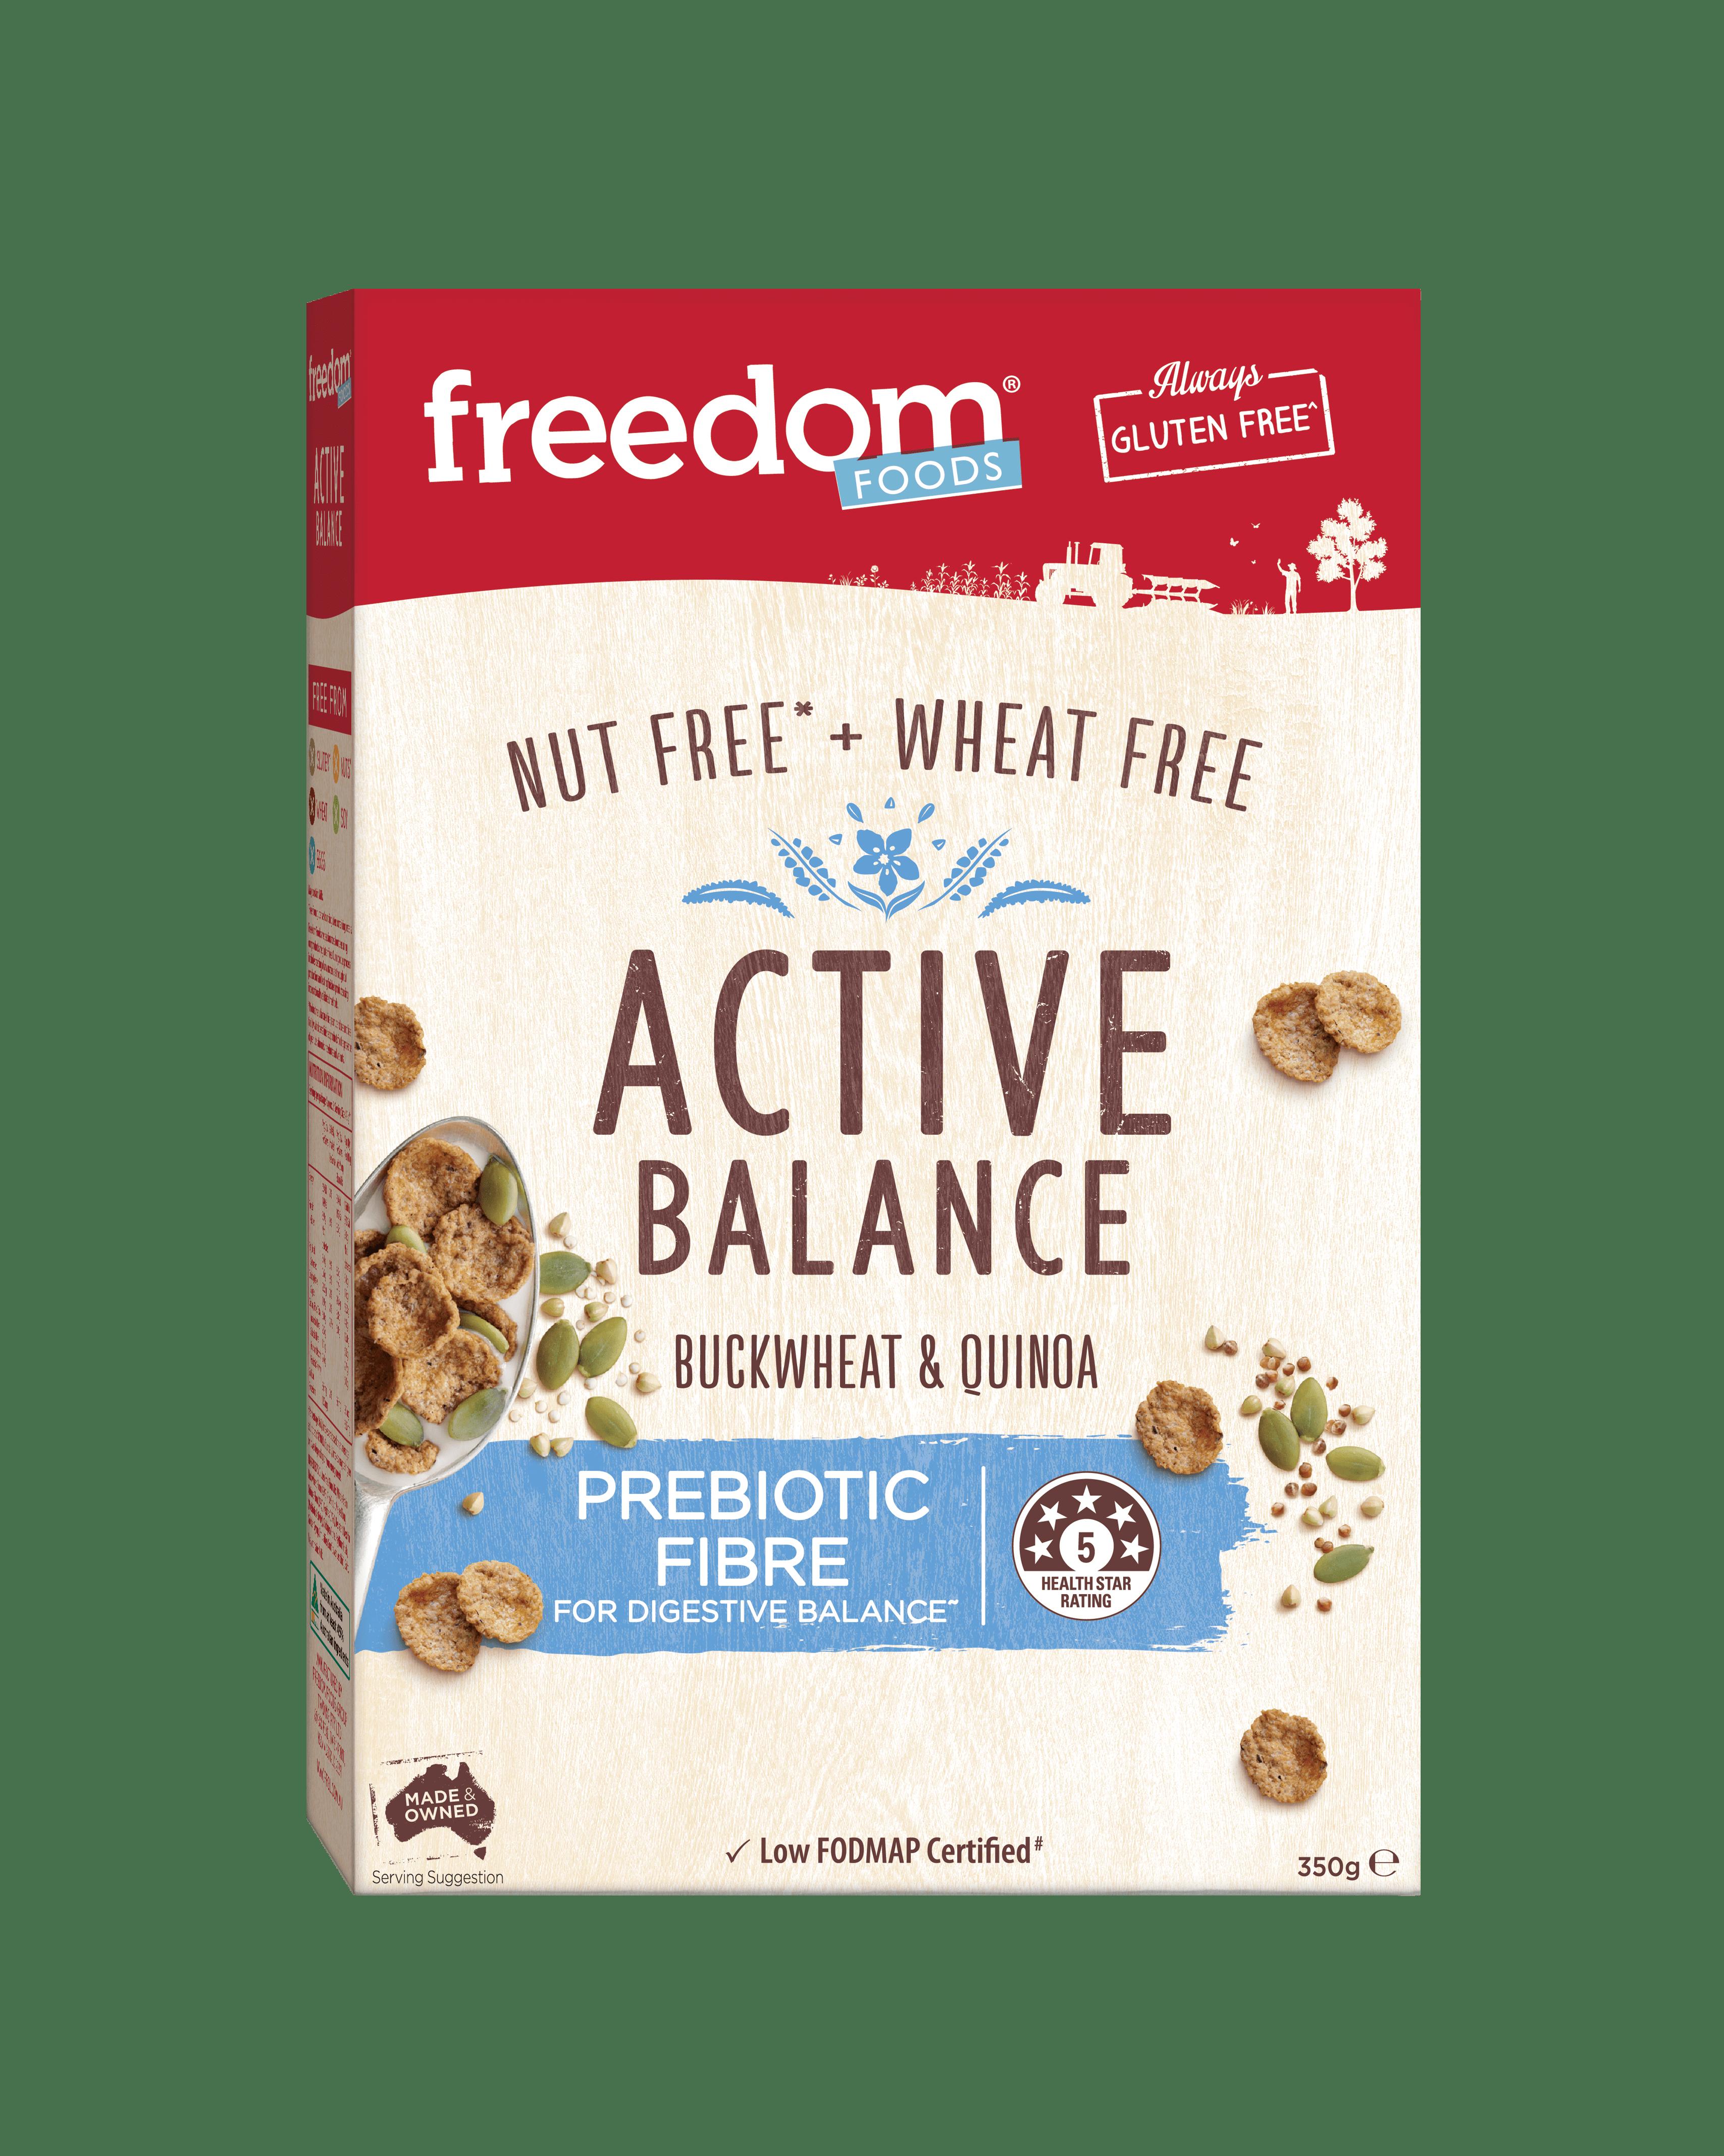 ACTIVE BALANCE BUCKWHEAT & QUINOA